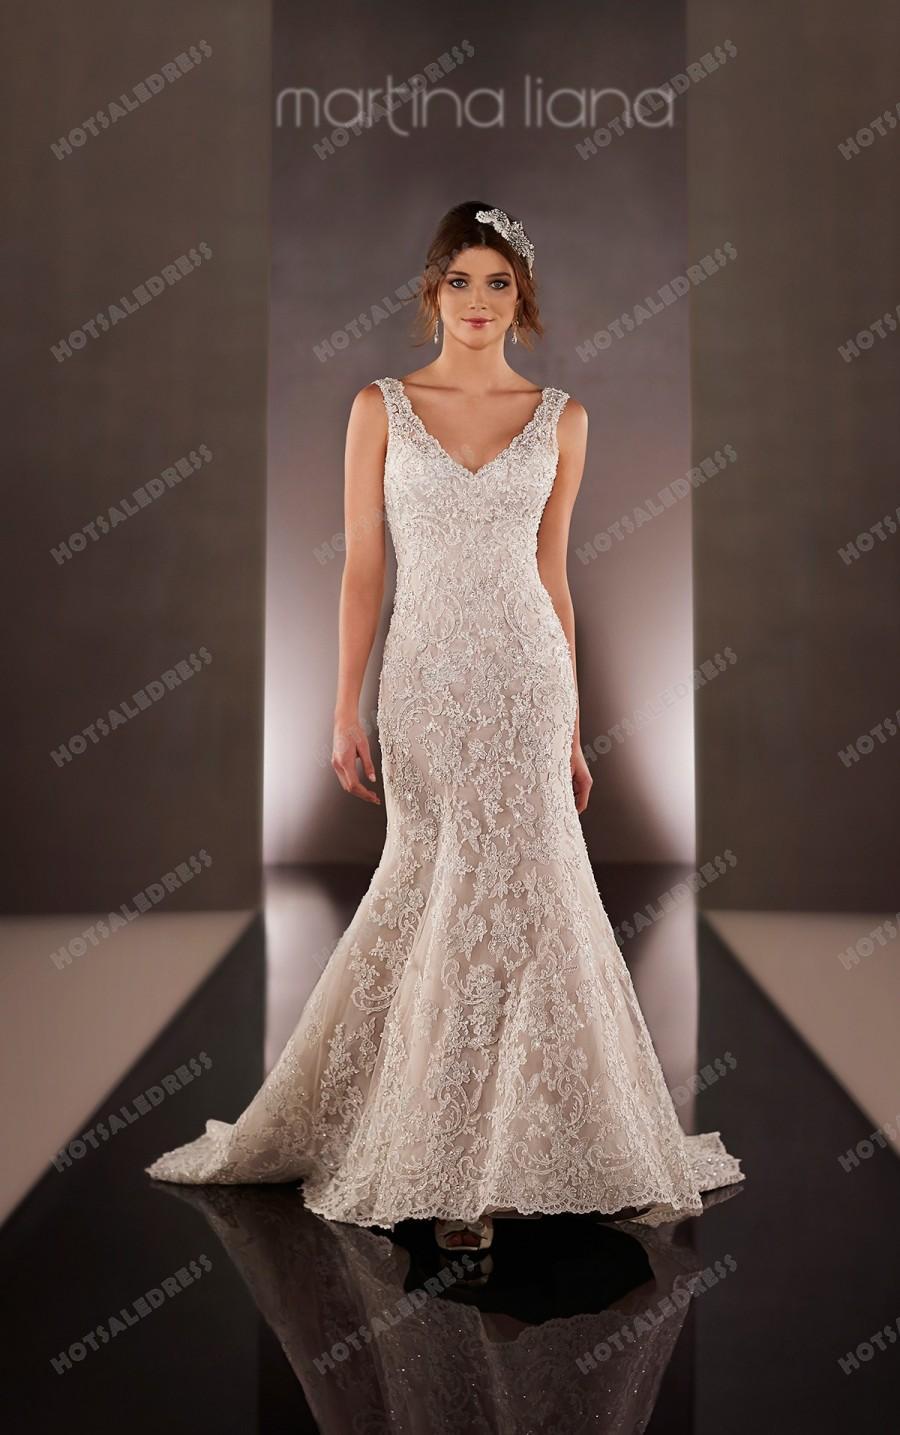 Mariage - Martina Liana Fit And Flare Designer Wedding Dress Style 673